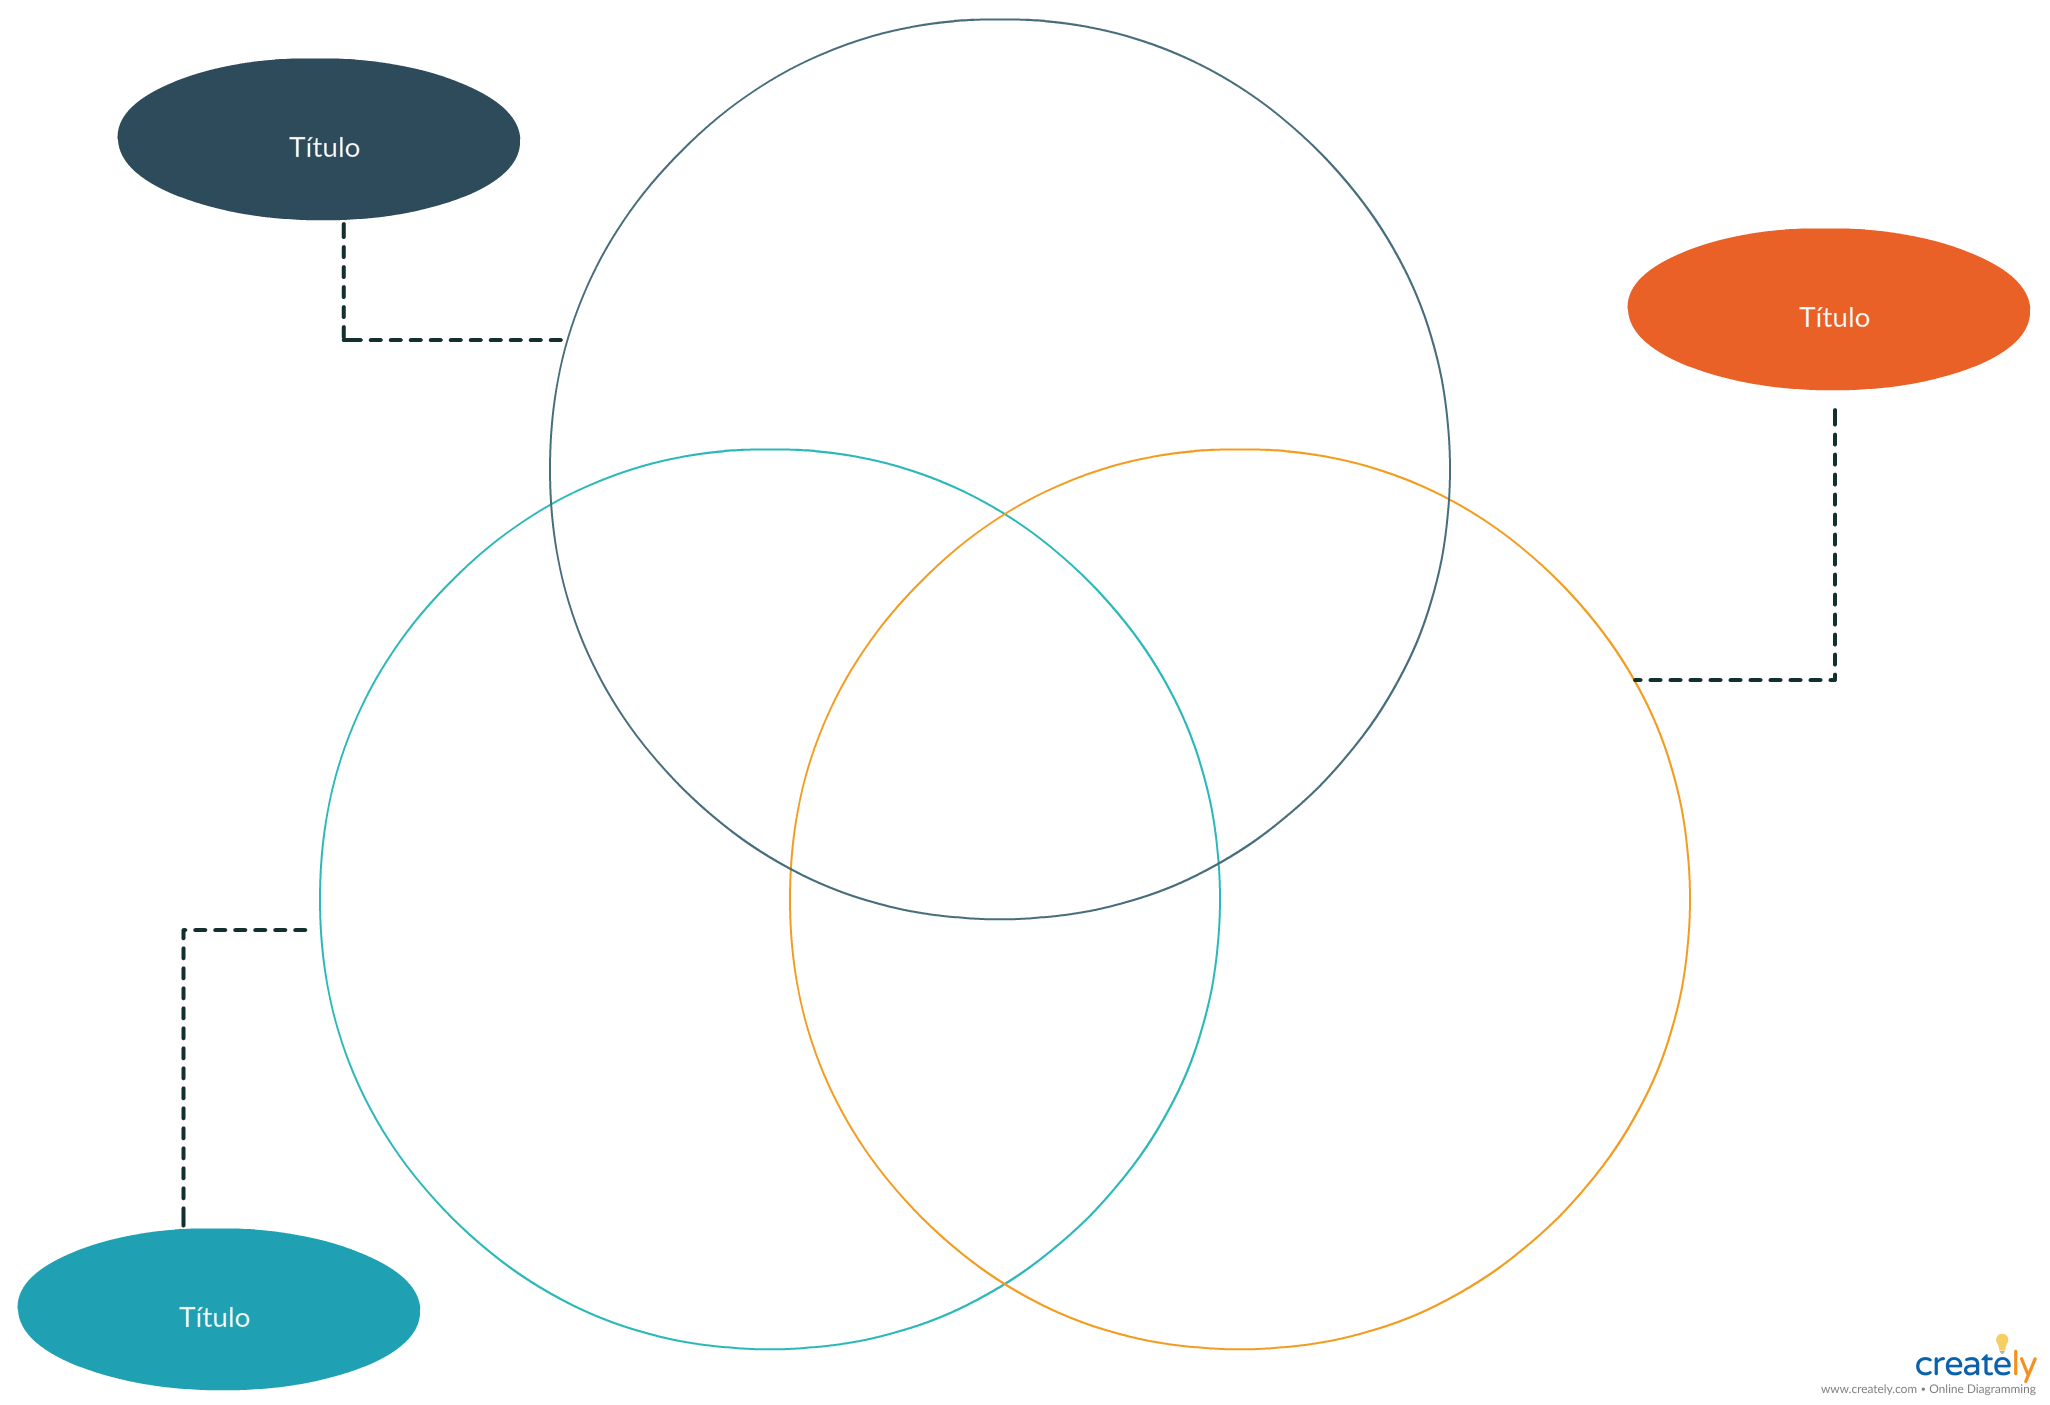 3 circulo diagrama de venn para descargar o modificar en linea puedes editar esta plantilla [ 2050 x 1405 Pixel ]